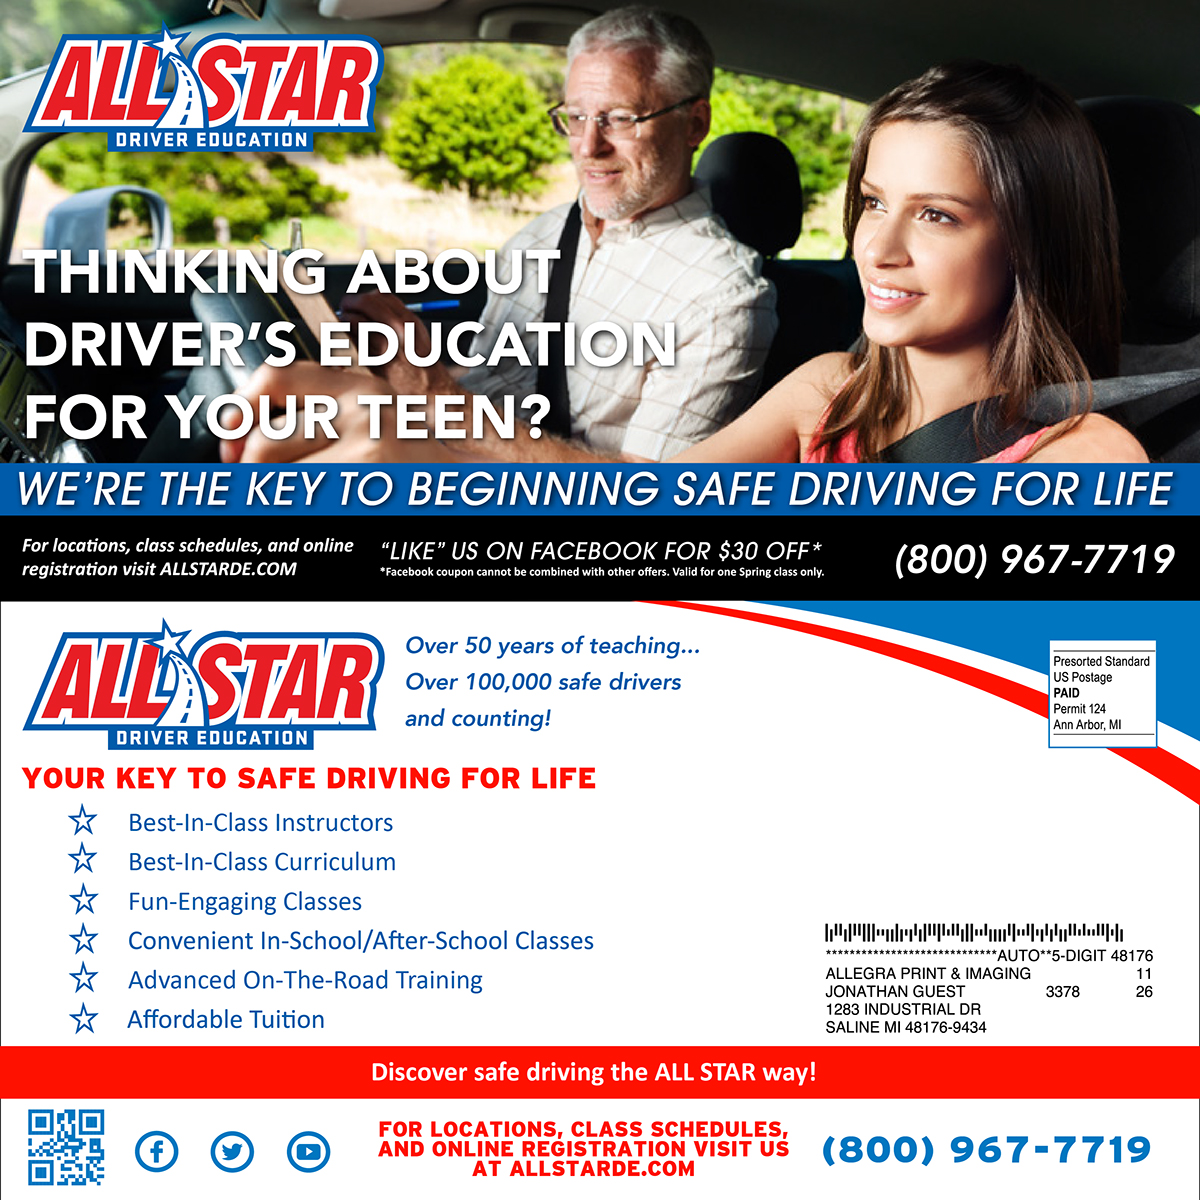 All Star Driver Education >> All Star Driver Education Postcards On Behance